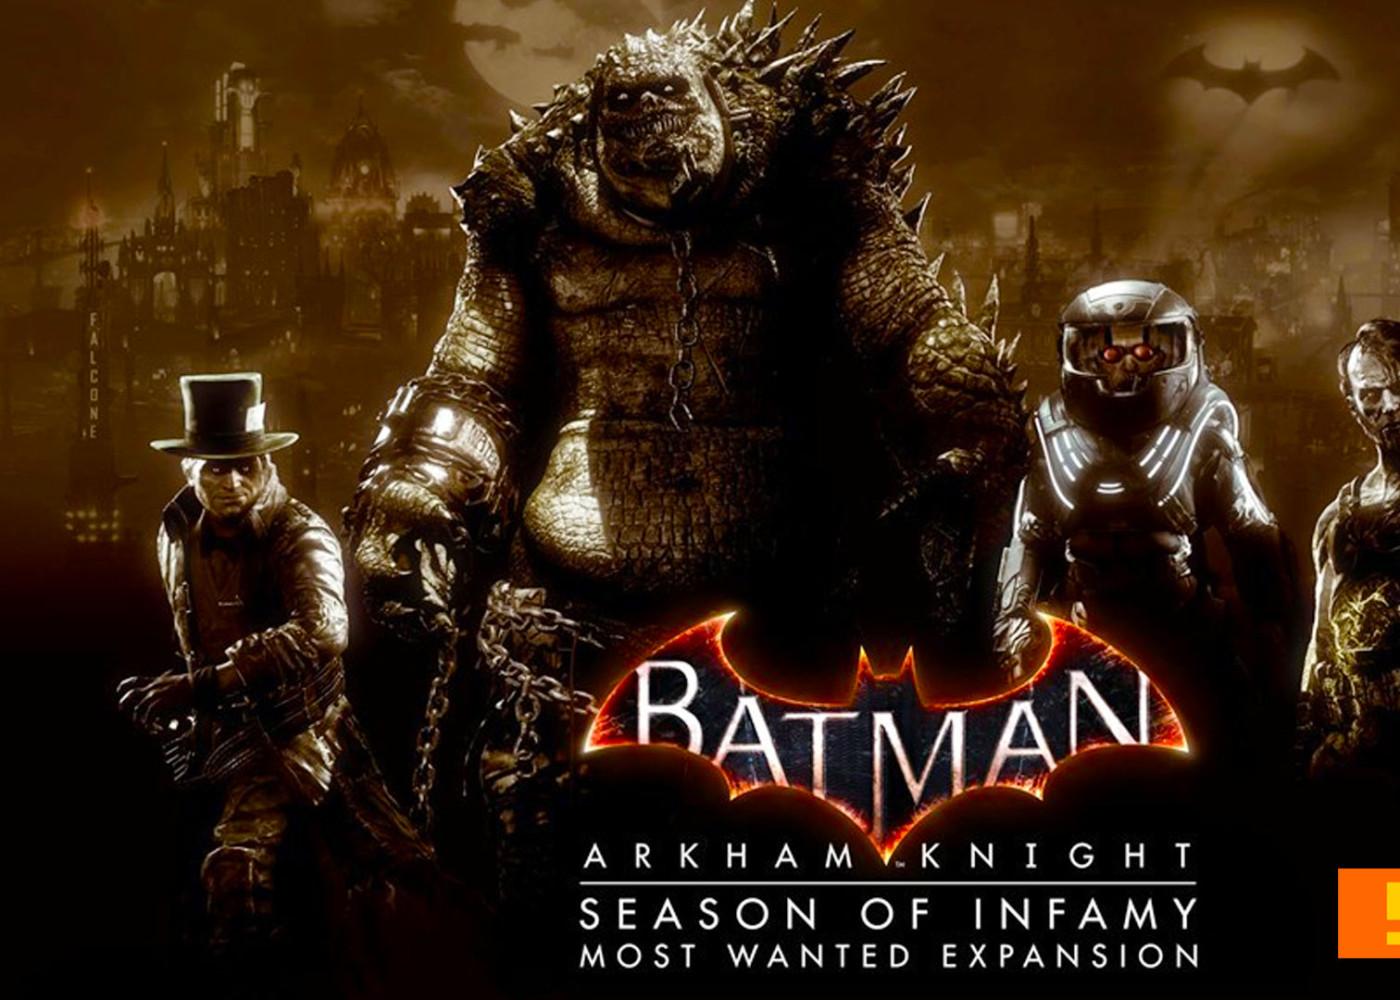 batman arkham knight season of infamy. the action pixel. rocksteady games, wb games, dc comics. the action pixel. @theactionpixel. #entertainmentontap